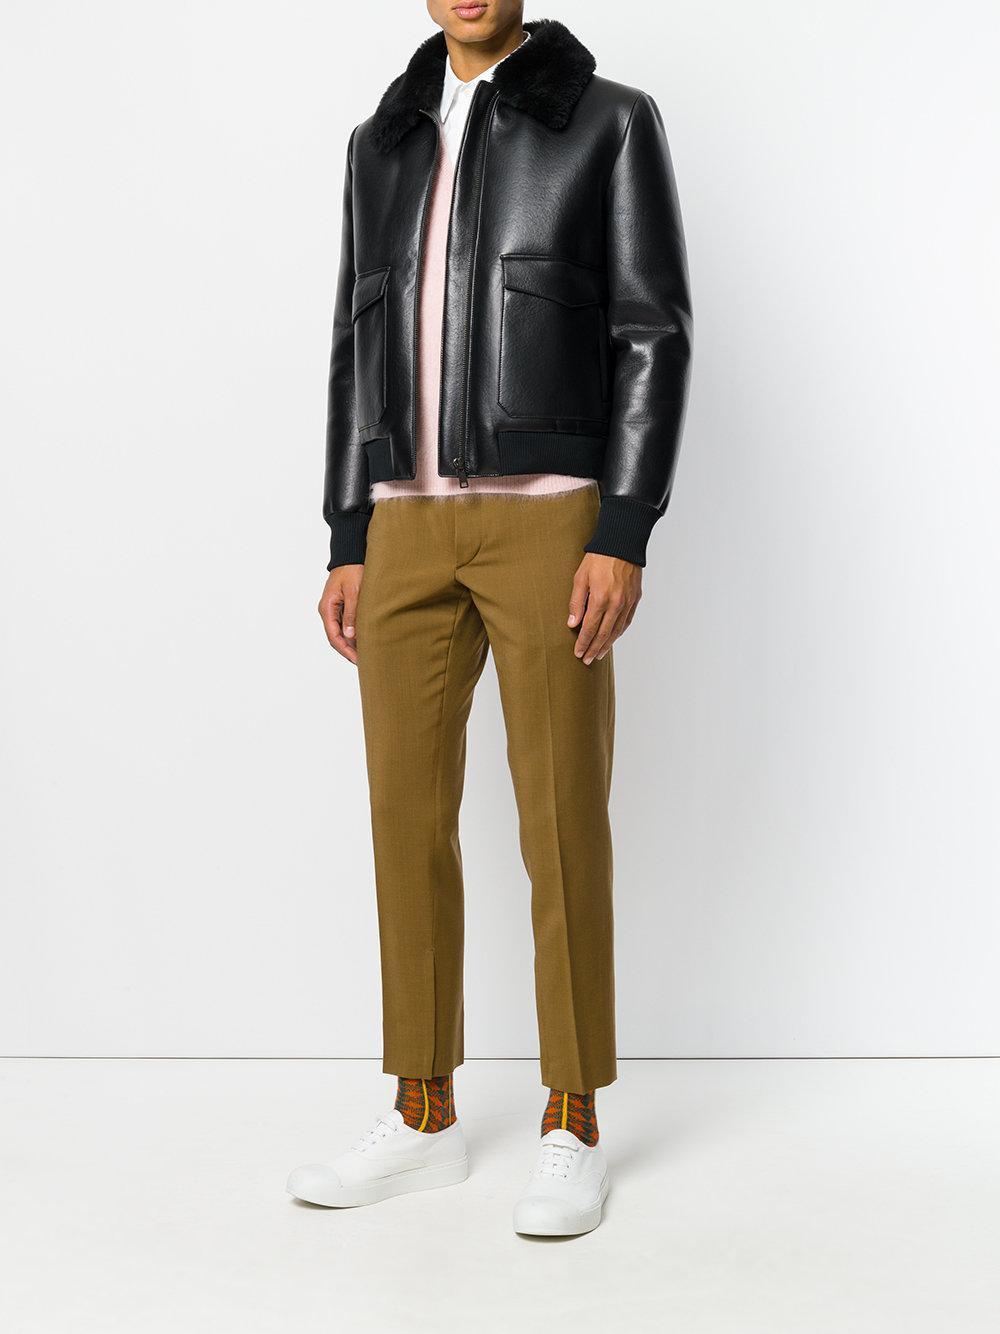 Prada Leather Shearling Collar Bomber Jacket in Black for Men